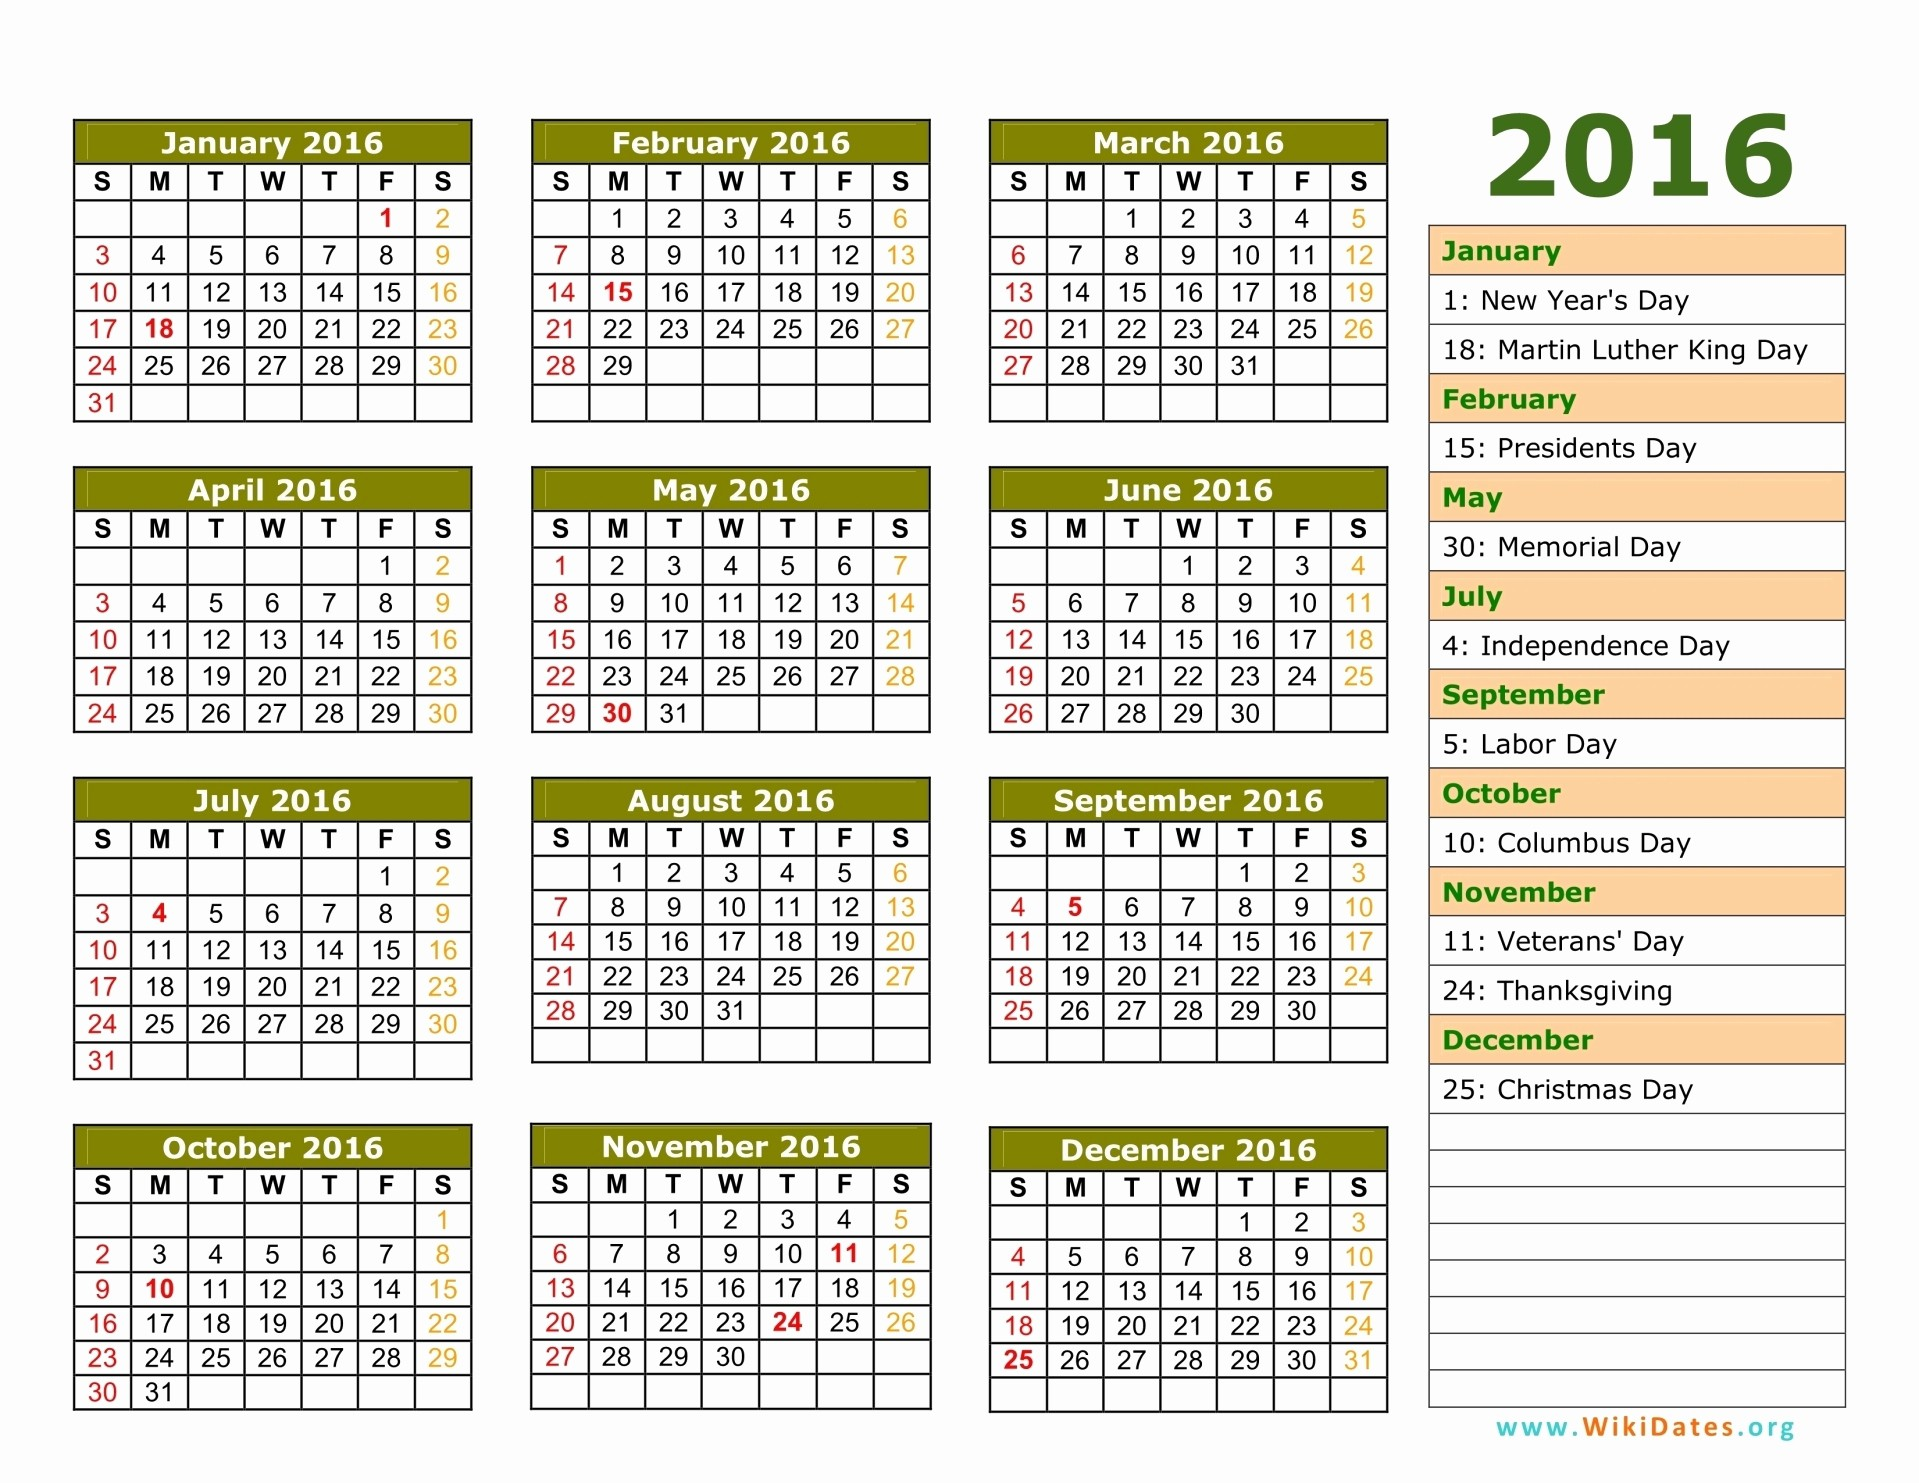 Calendar 2016 Printable with Holidays Fresh 2016 Calendar